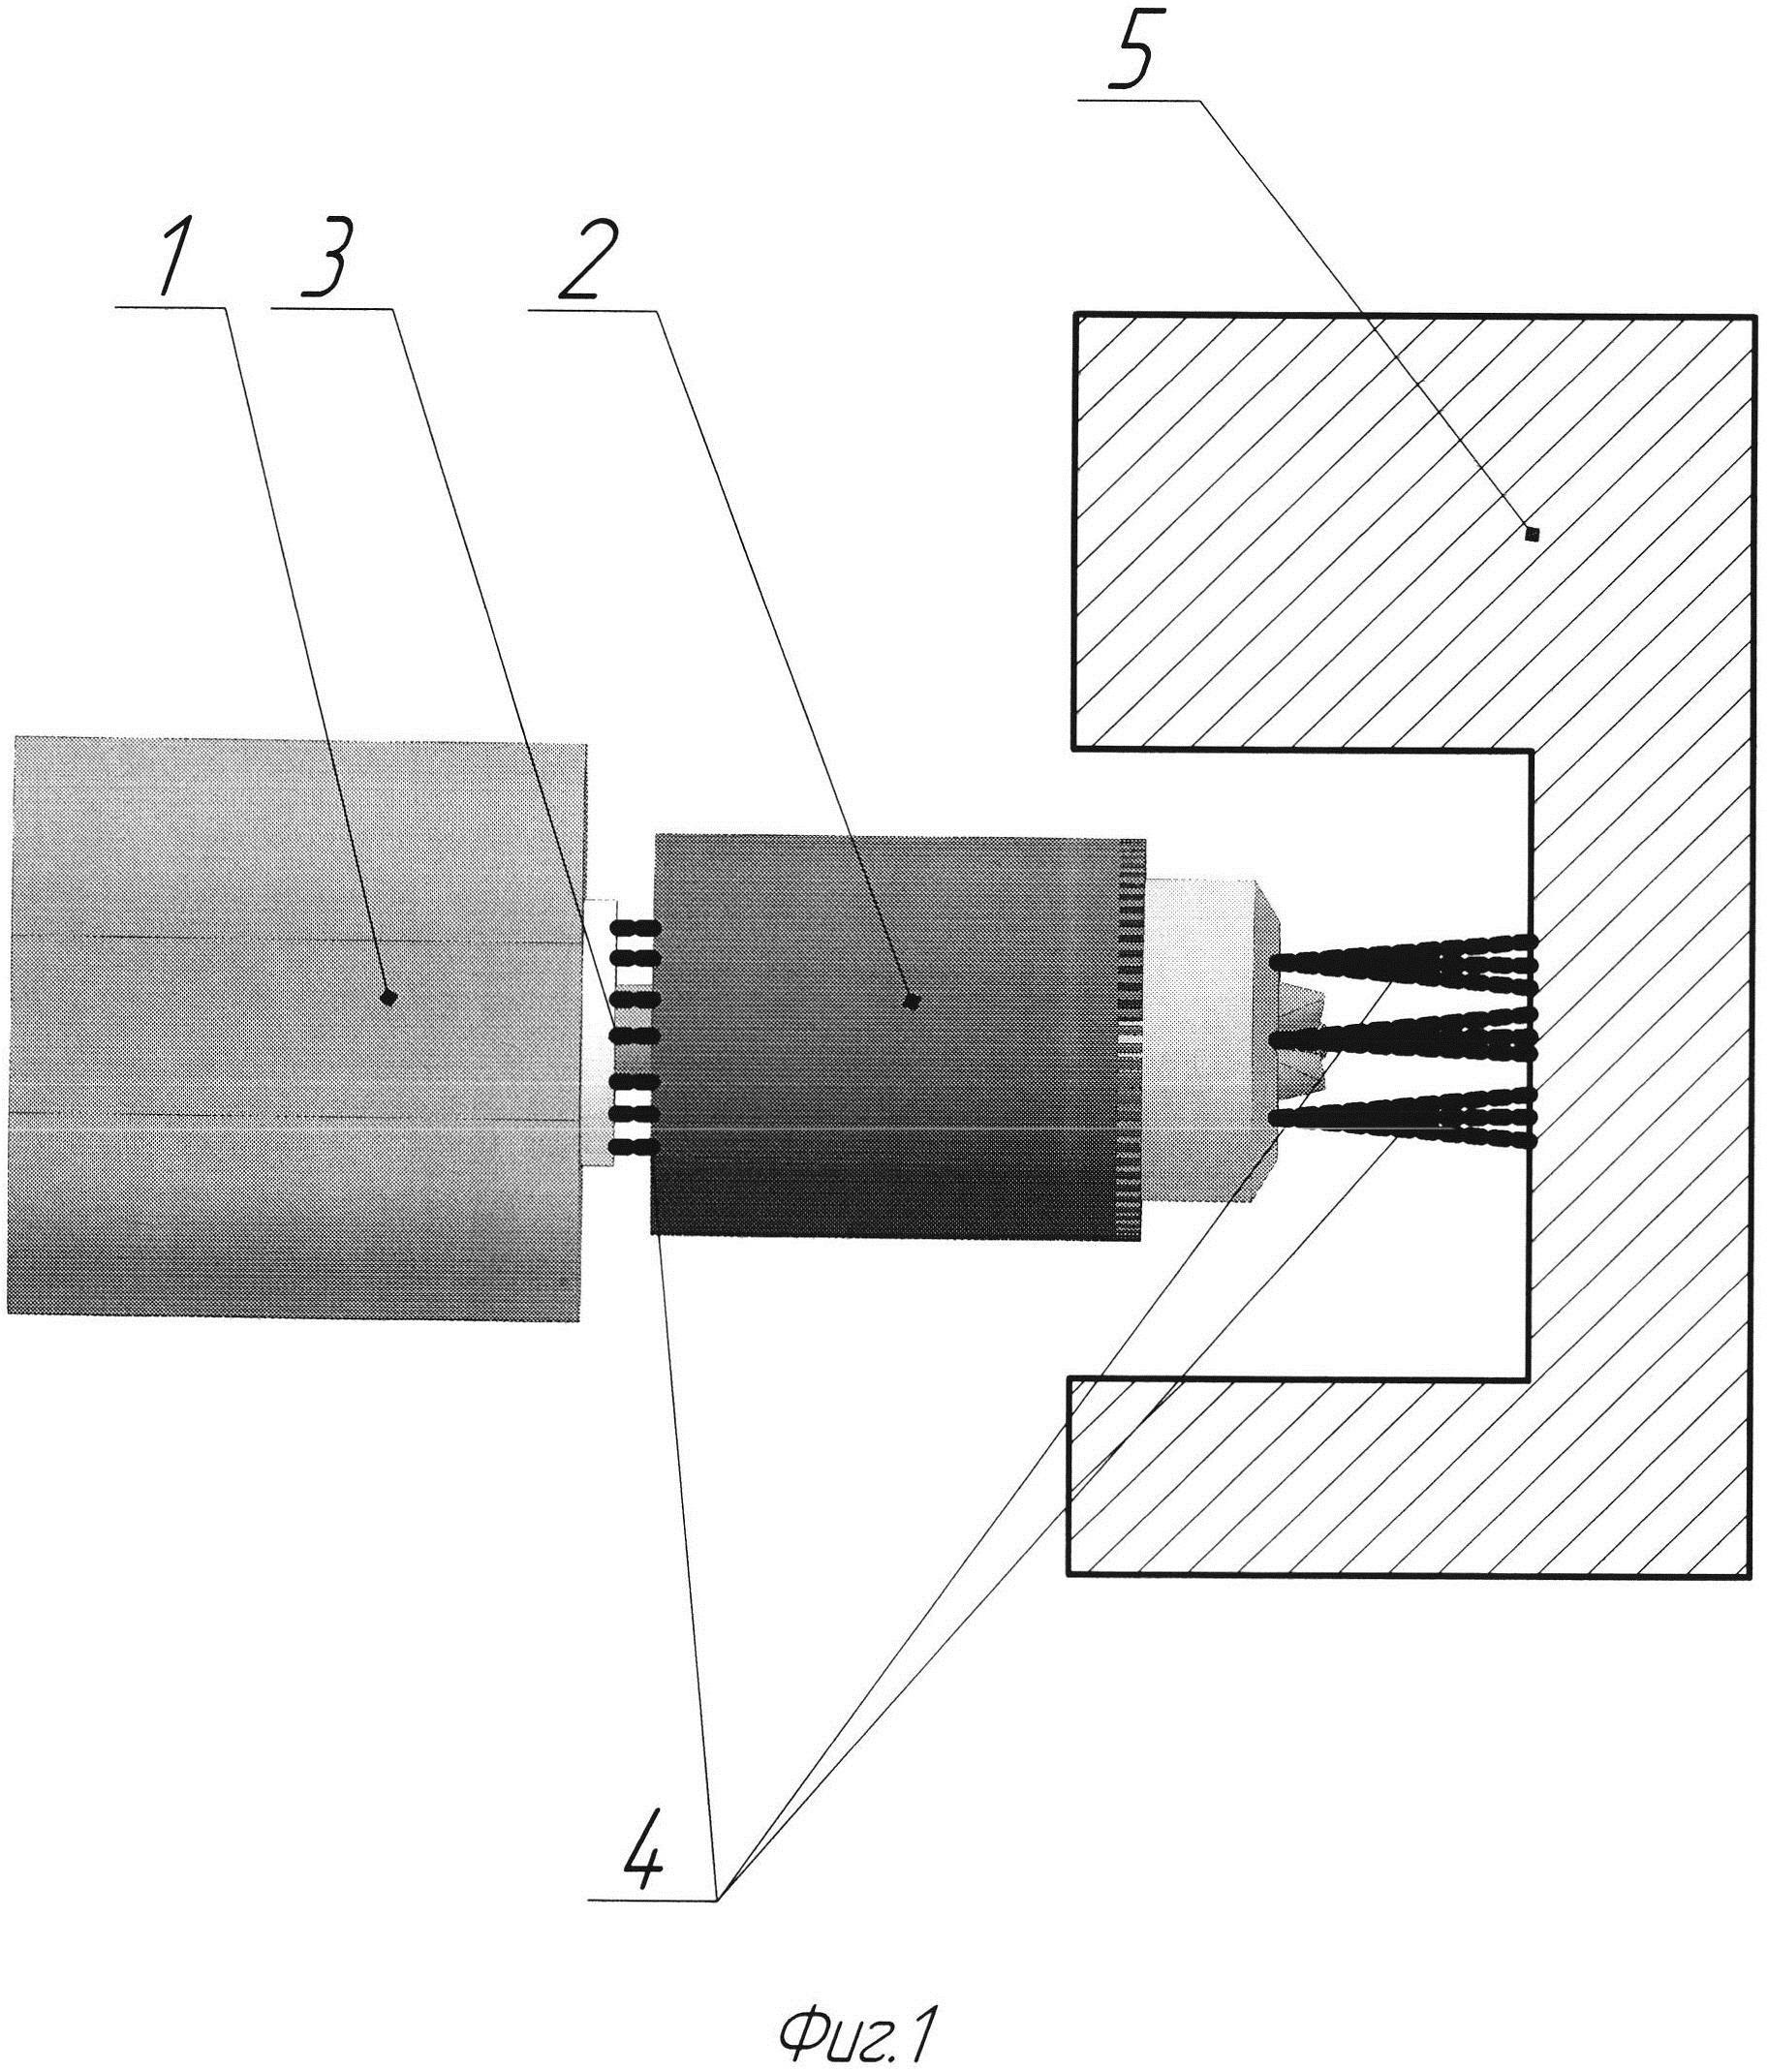 Патрон дрели, шуруповерта или станка с подсветкой цели